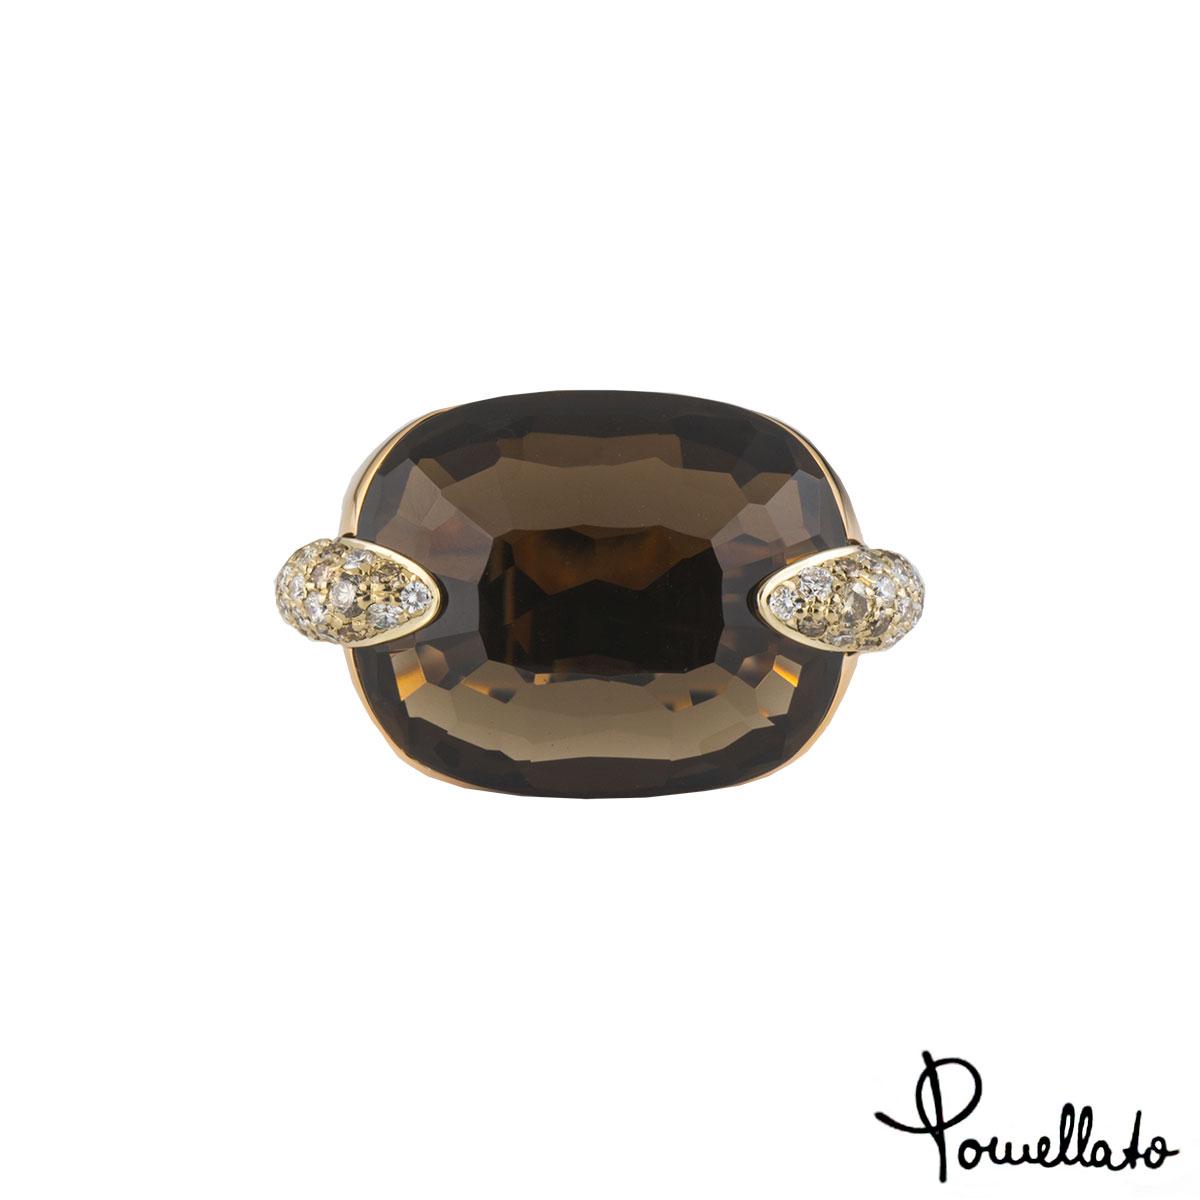 Pomellato Rose Gold Diamond and Quartz Ring